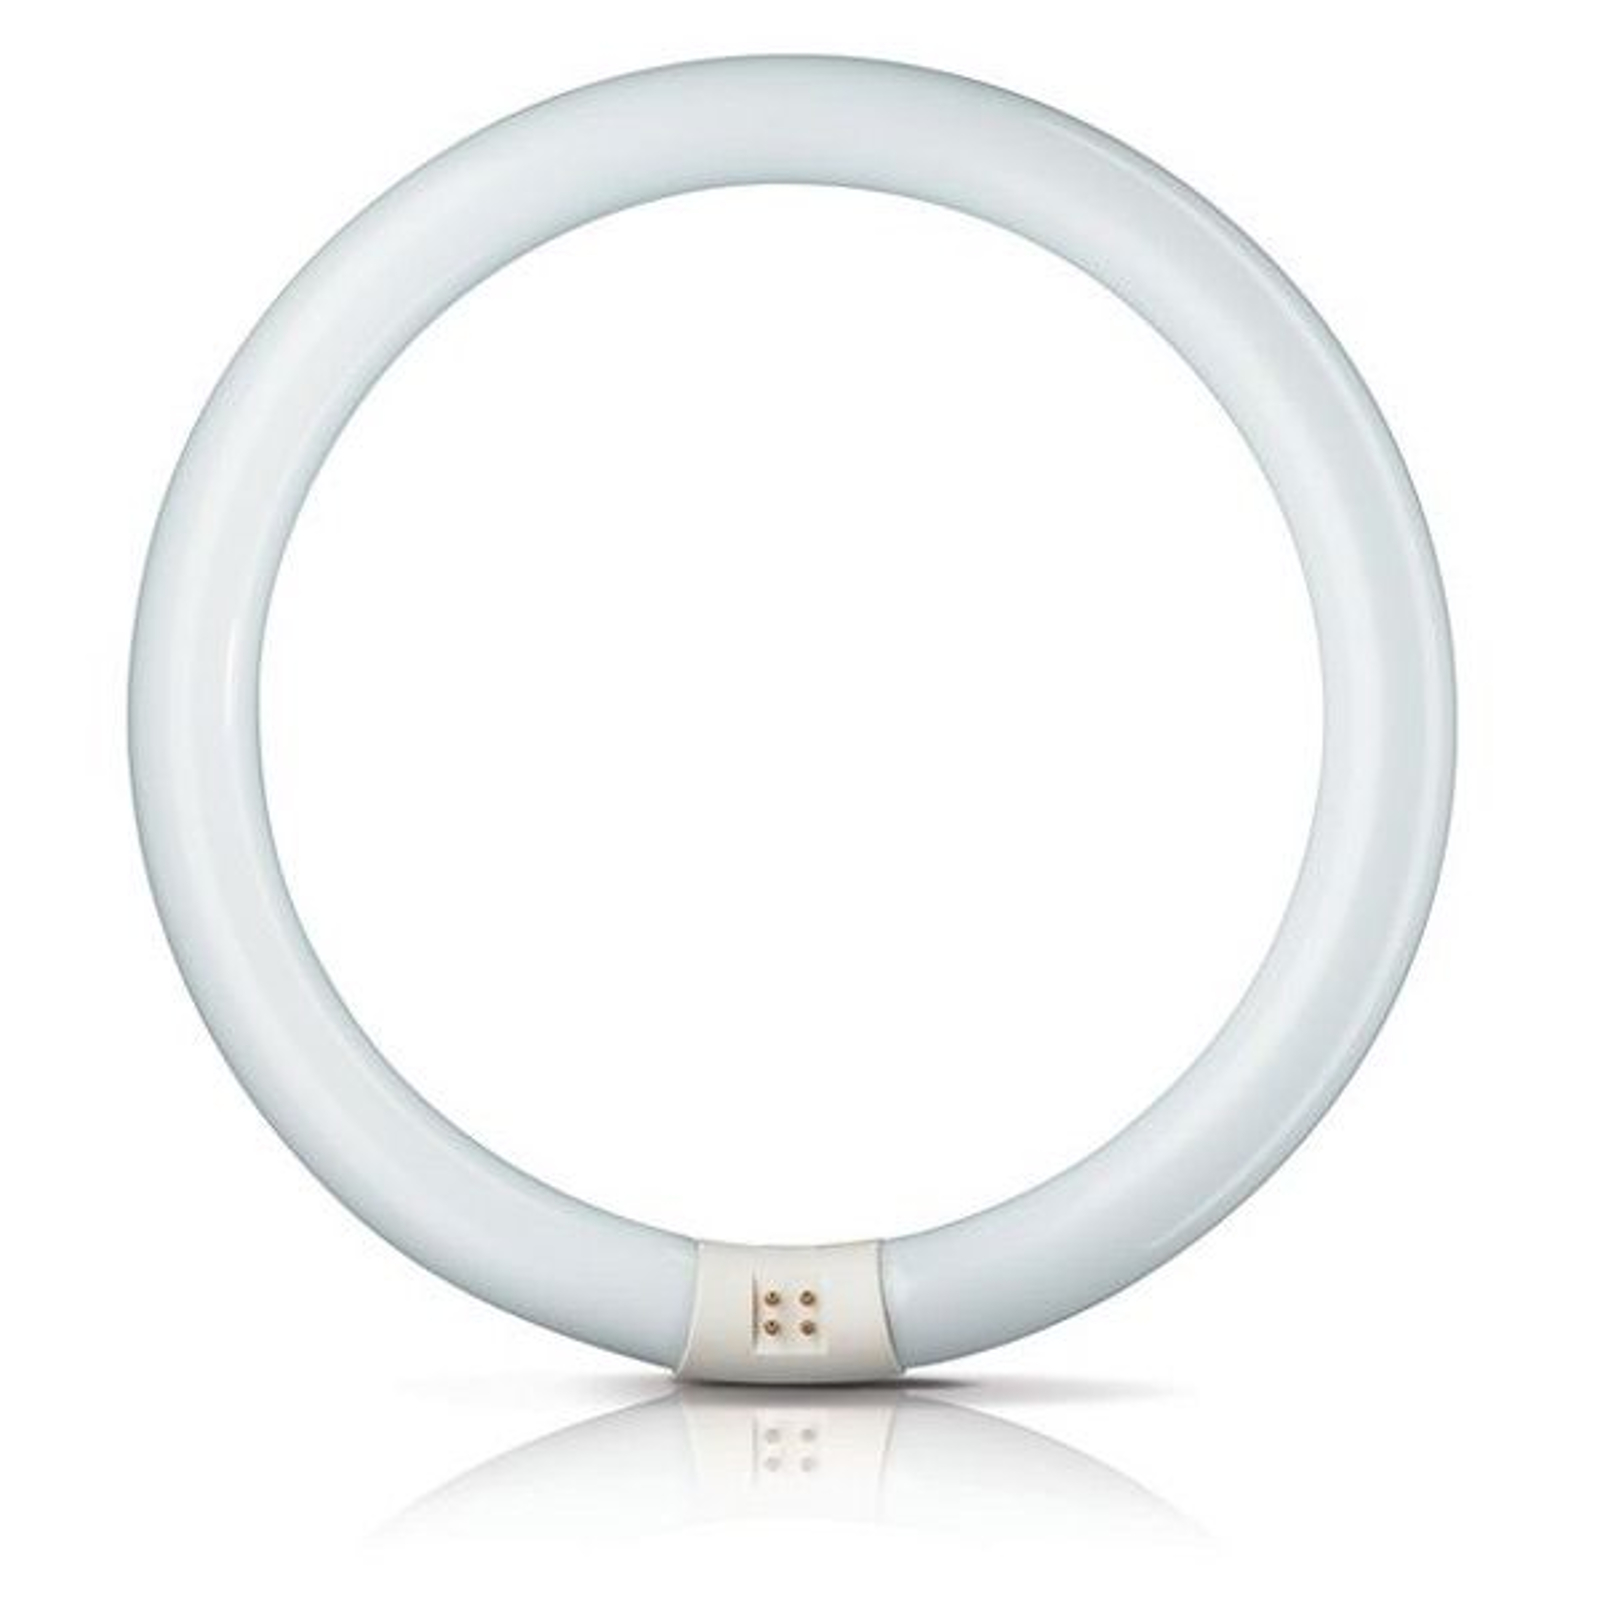 G10q 32W 830 Leuchtstoffring Master Circular TL-E